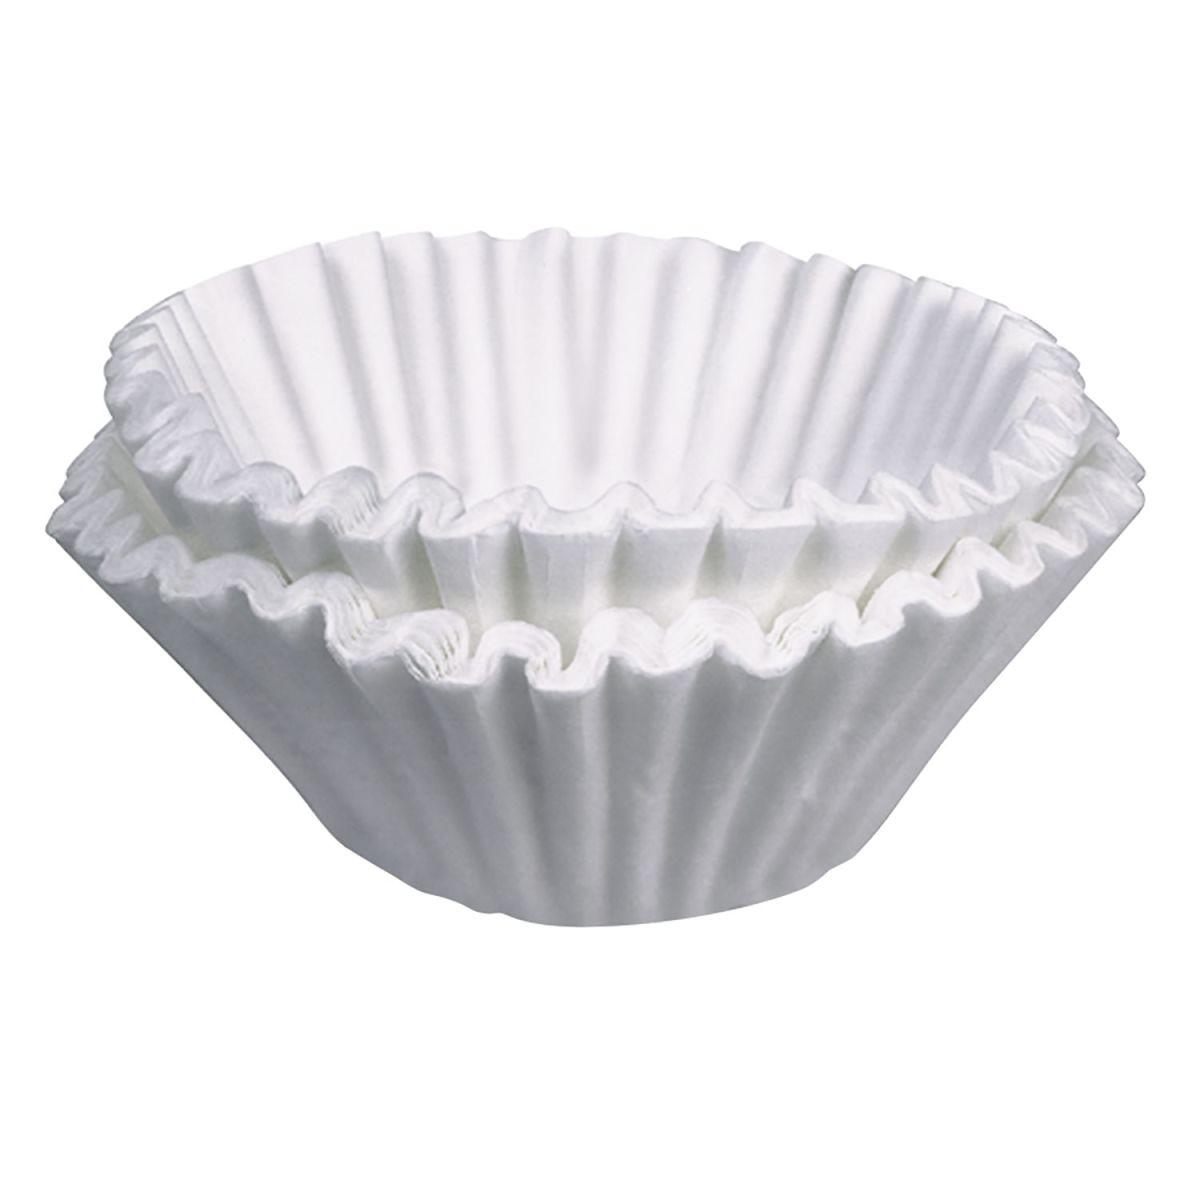 Gourmet C Funnel Paper Filters 1000cs Paper Filters